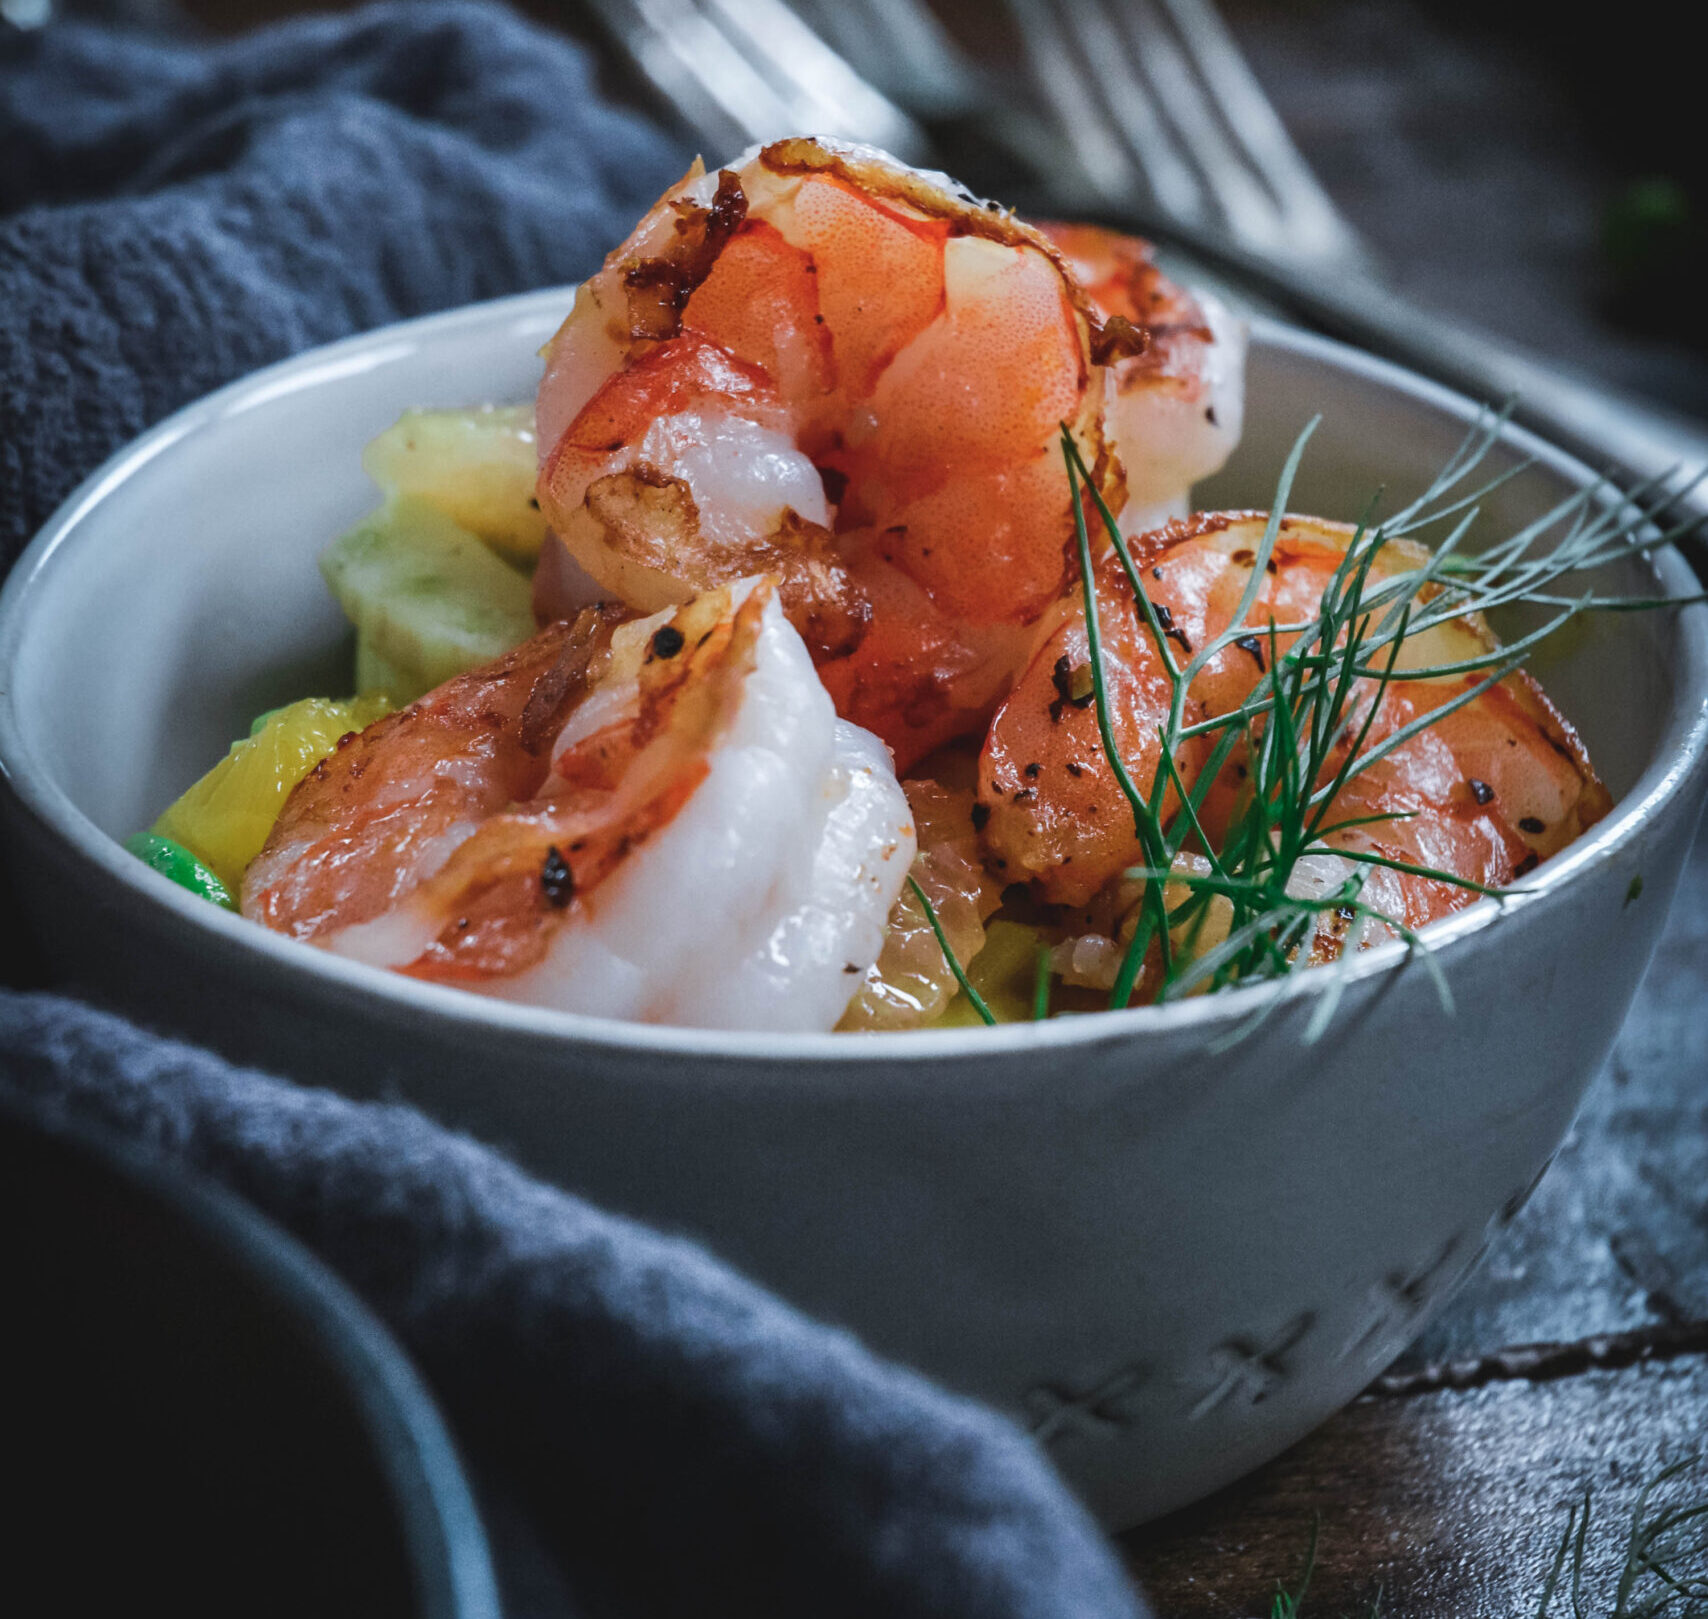 Shrimp Salad with Fennel, Citrus and Avocado